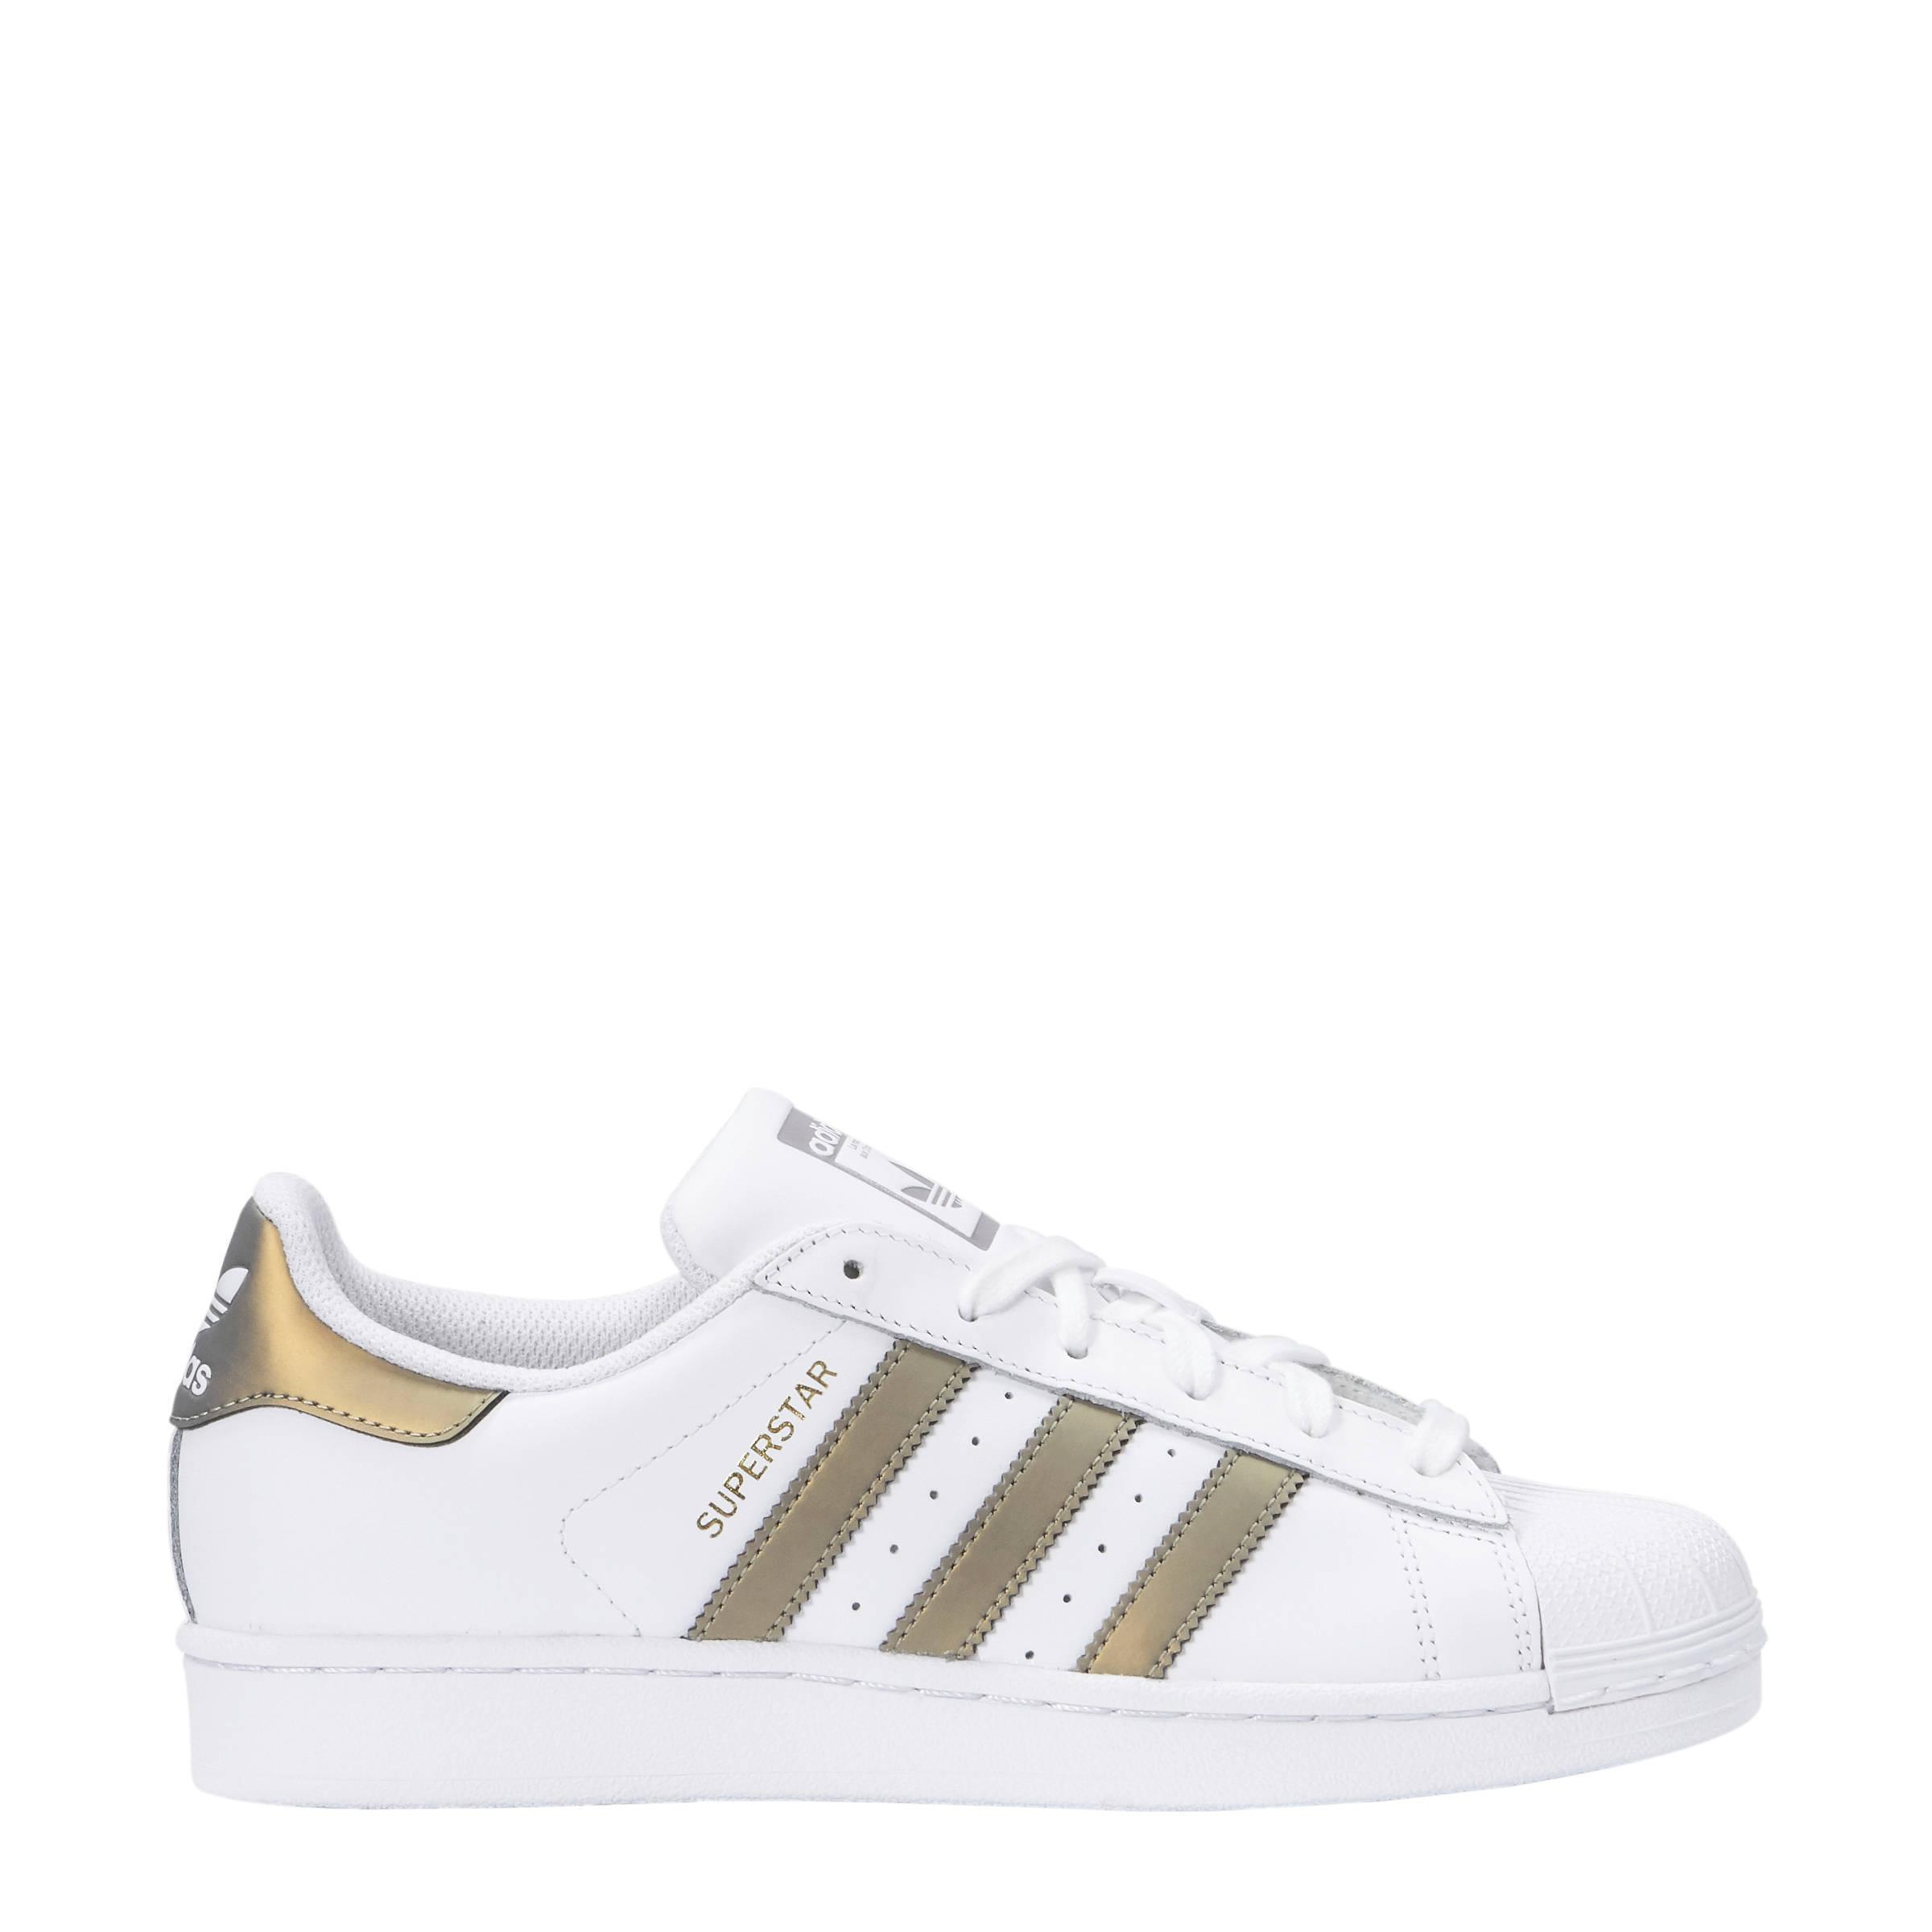 timeless design 7b5f1 218c3 adidas originals Superstar sneakers wit brons   wehkamp